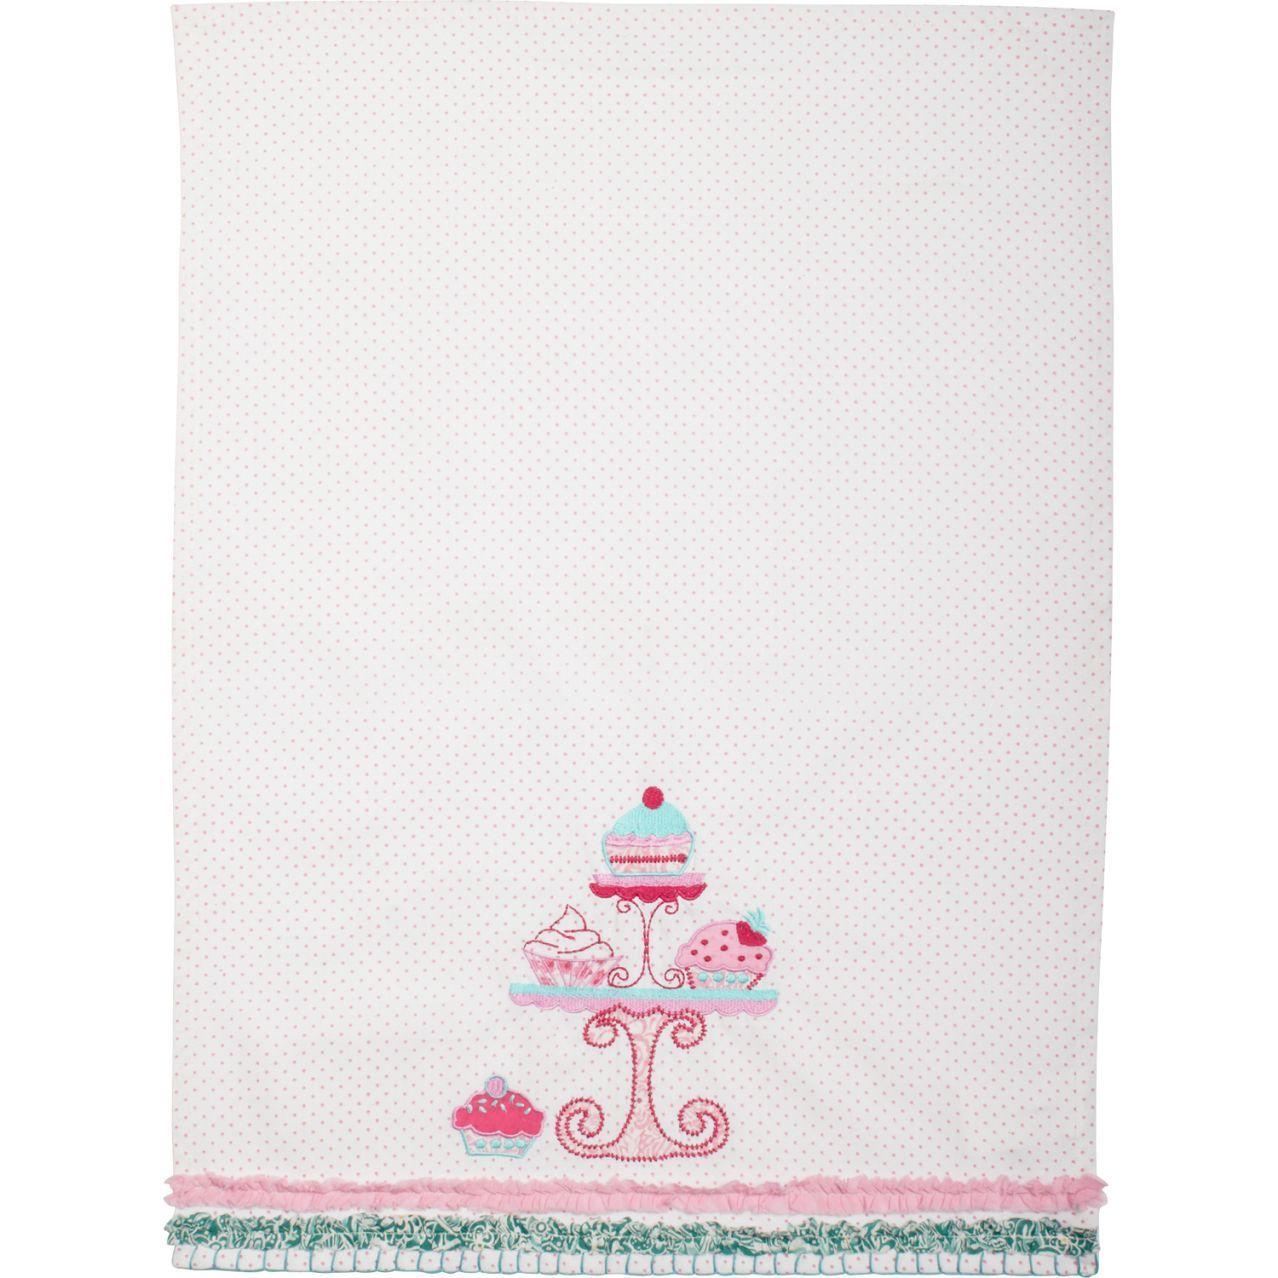 Pink Cupcake Vintage Inspired Kitchen Towel Sur La Table Pink Cupcakes Kitchen Towels Vintage Inspired